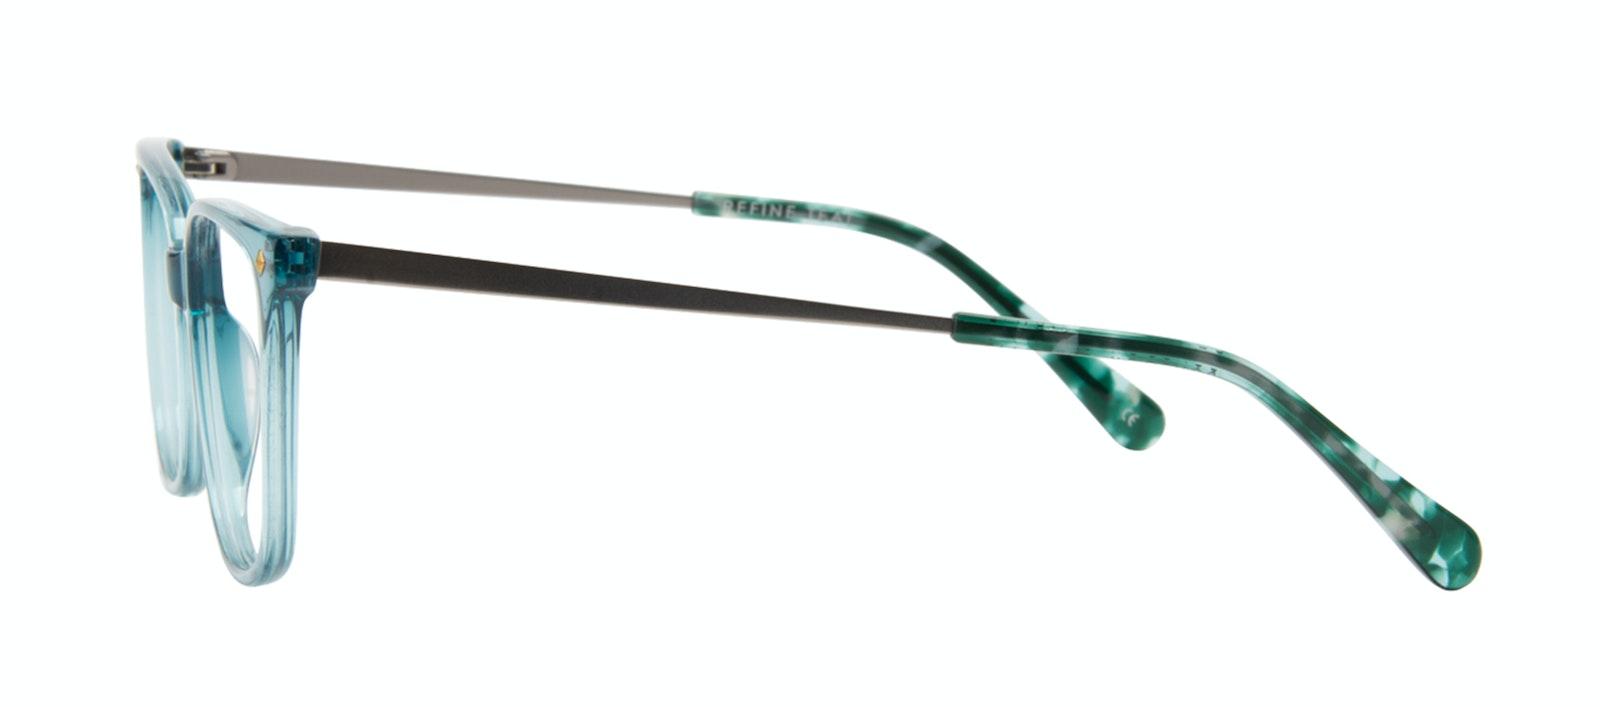 Affordable Fashion Glasses Rectangle Square Eyeglasses Women Refine Teal Side